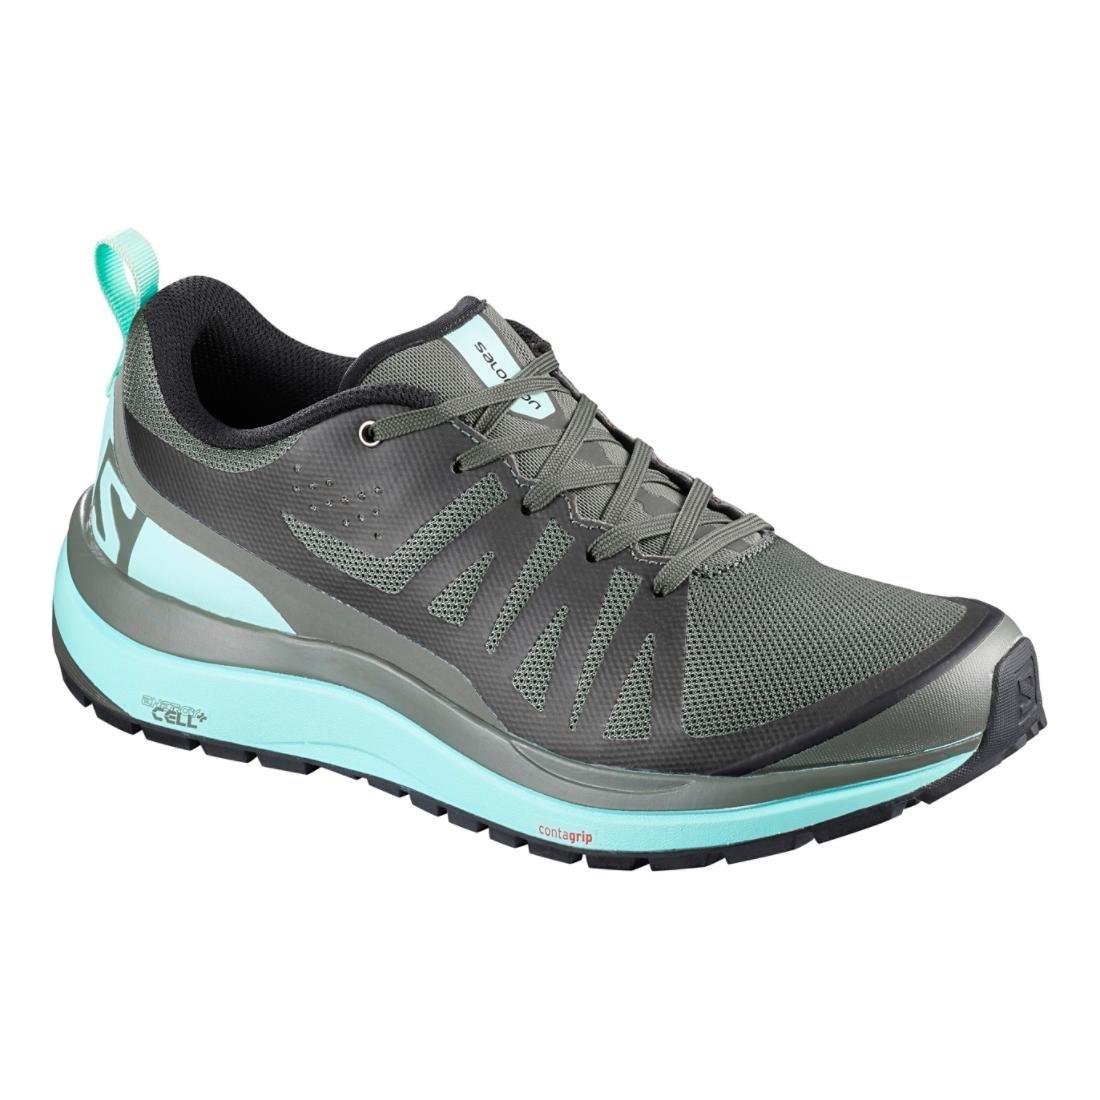 Salomon Women Odyssey Pro Low Hiking Shoes B01MRO4LE5 6|CASTOR GRAY/EGGSHELL